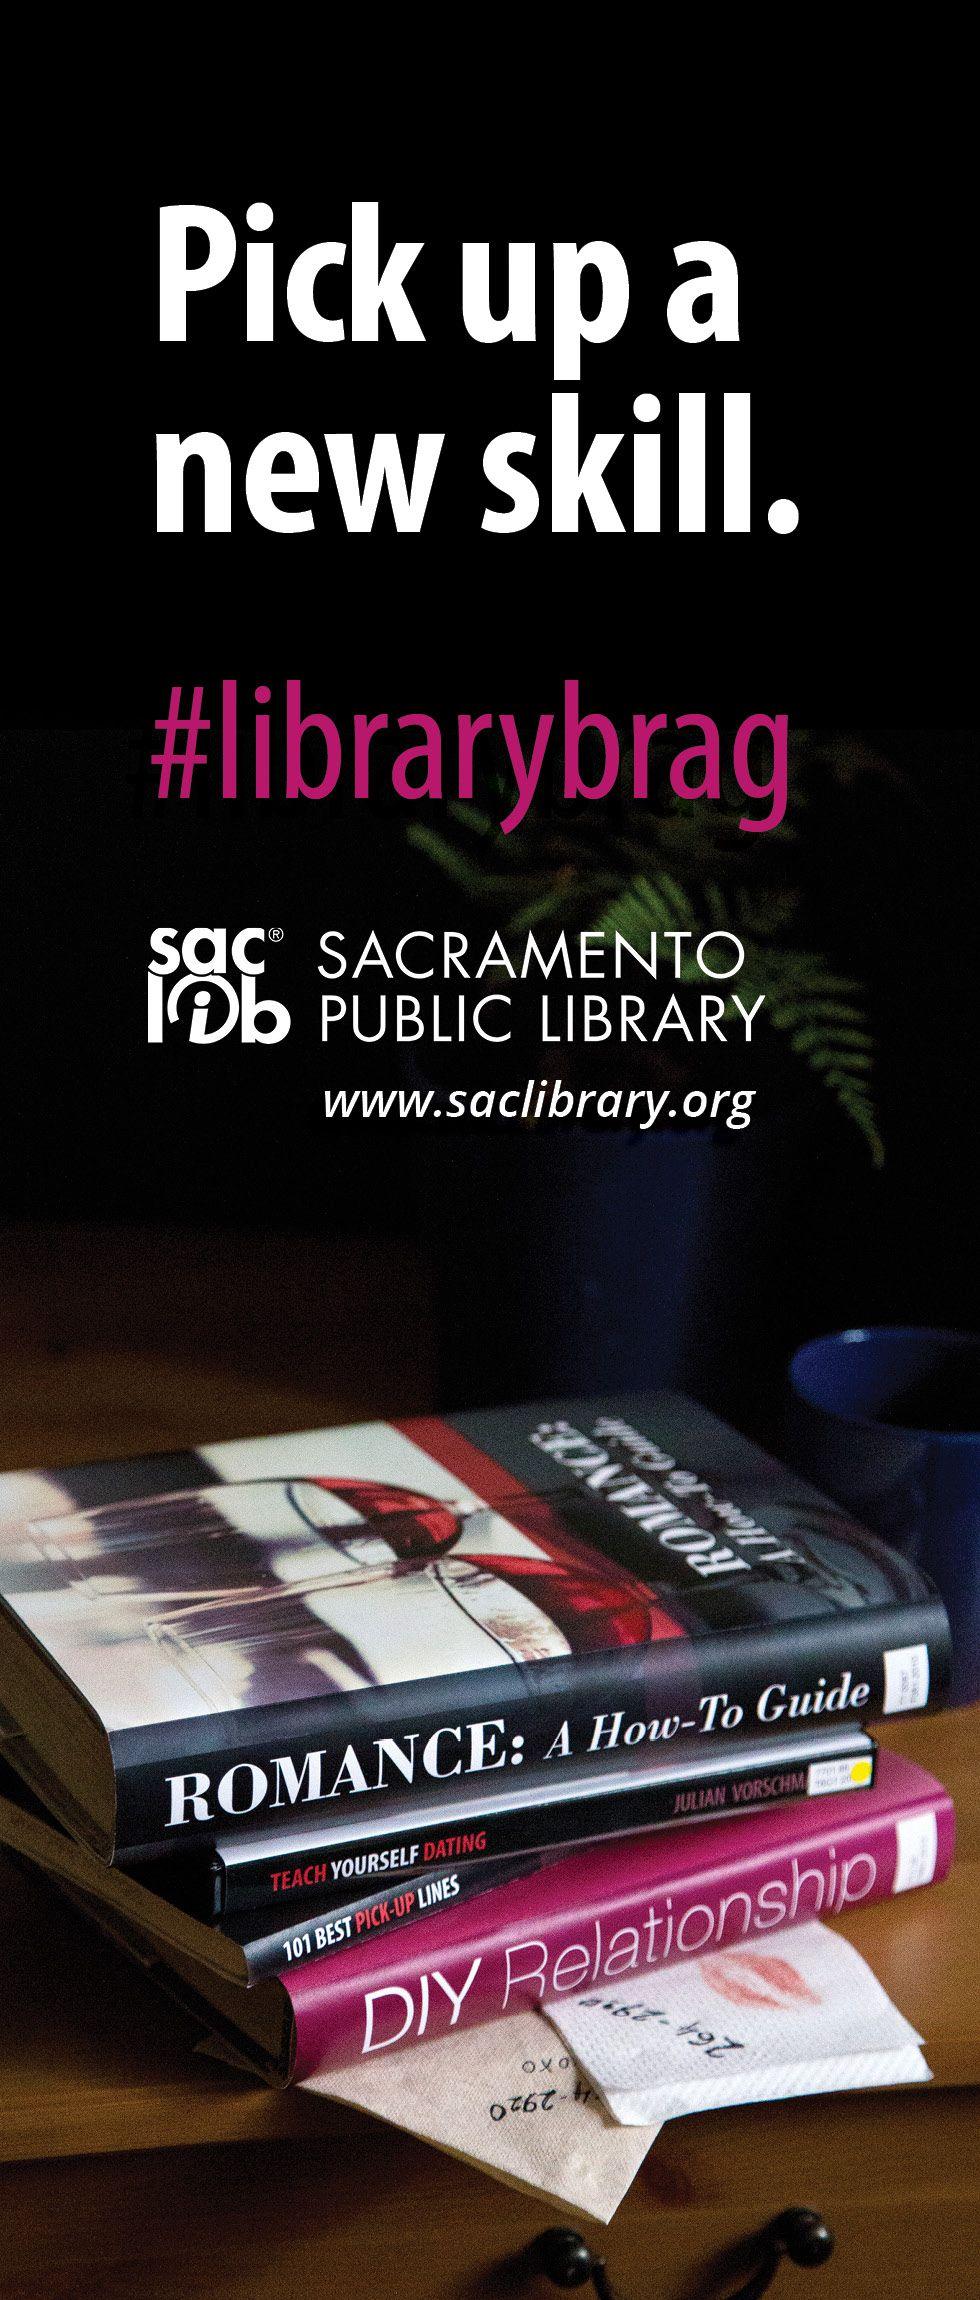 Pick up a new skill. #librarybrag